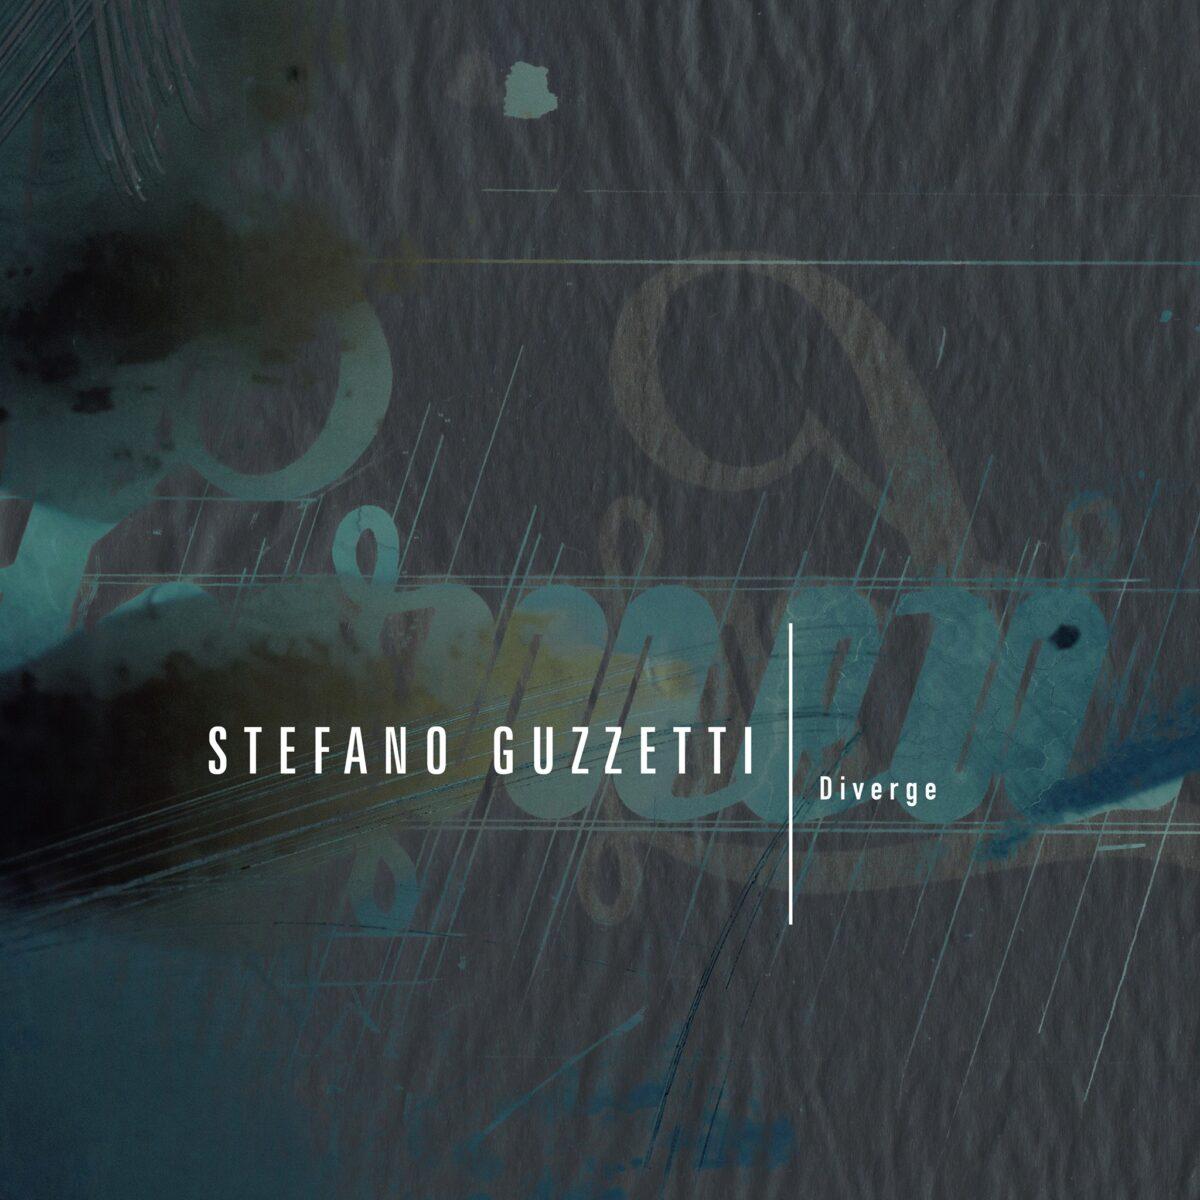 Stefano Guzzetti - Diverge - Lucem - Believe Distribution Services - 2020 Editions - Spotify - singolo - Federico Murzi - 2021 - Sa Scena - 12 aprile 2021